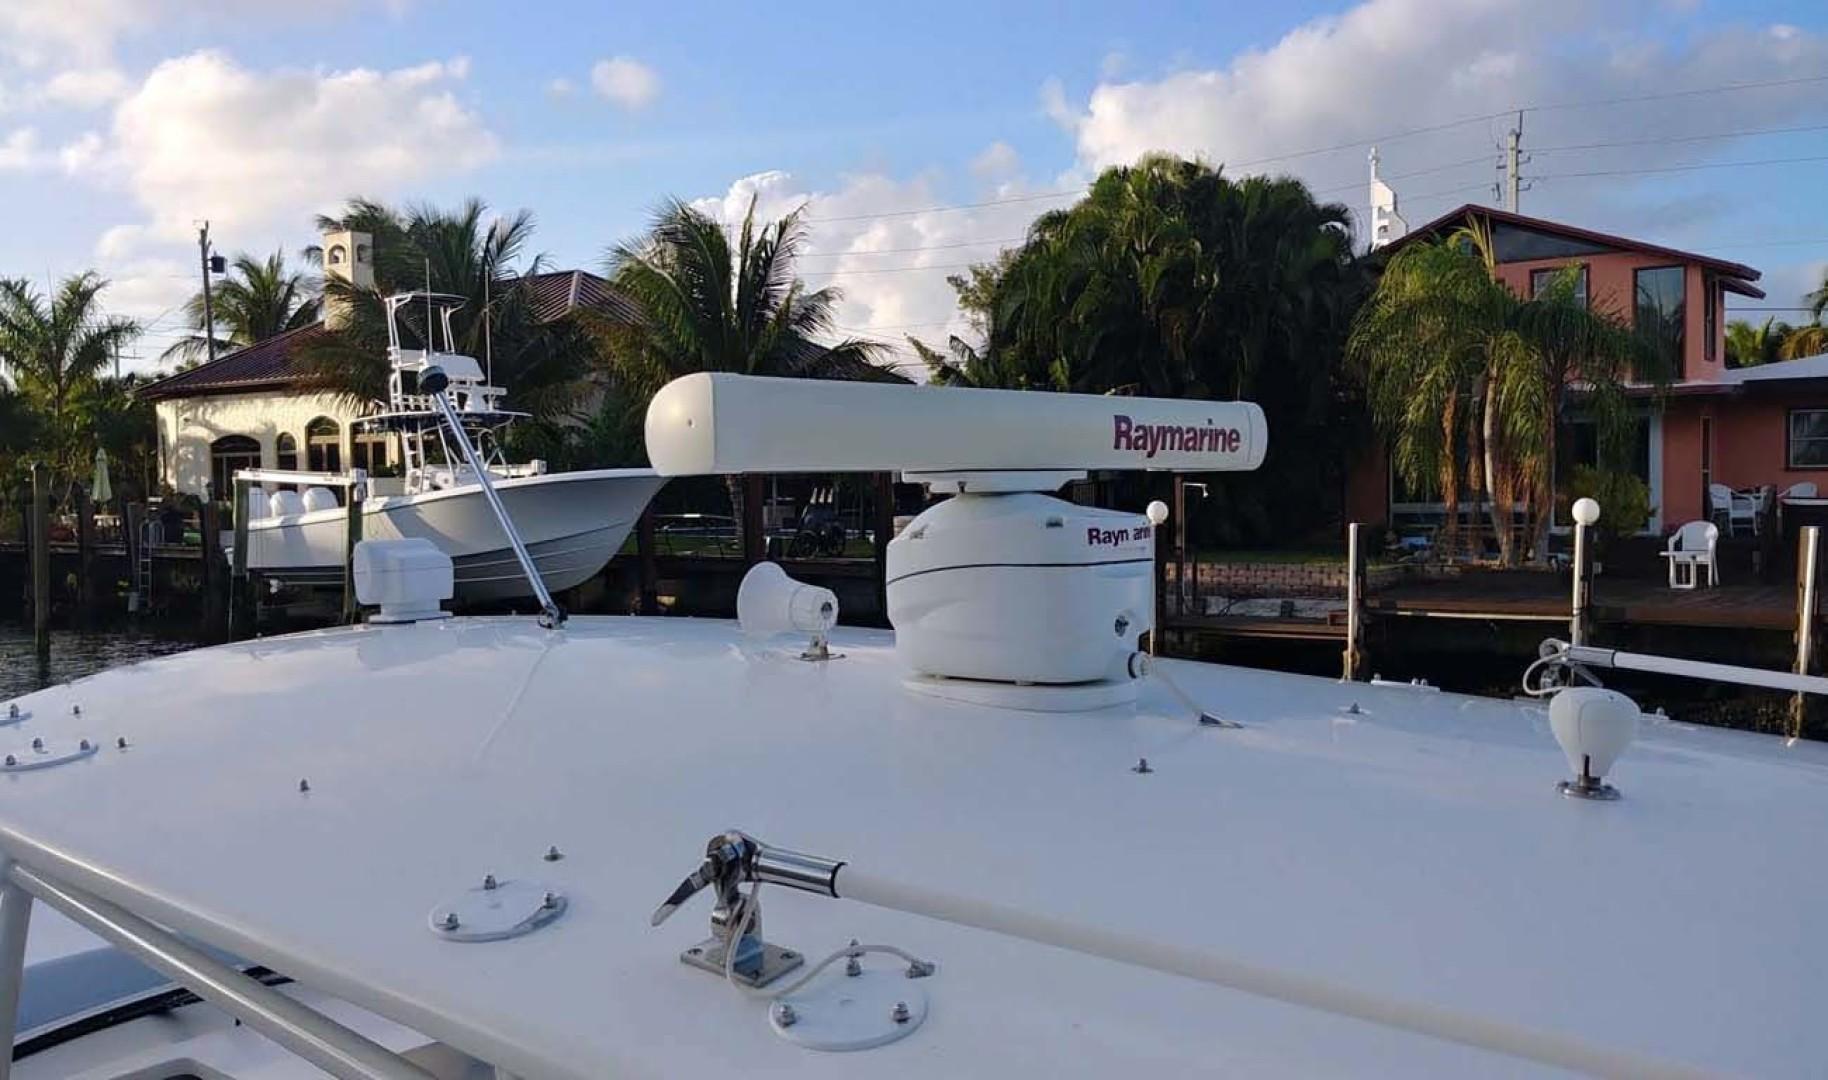 Intrepid-377 Walkaround 2006 -Pompano Beach-Florida-United States-Raymarine Radar-1322770 | Thumbnail